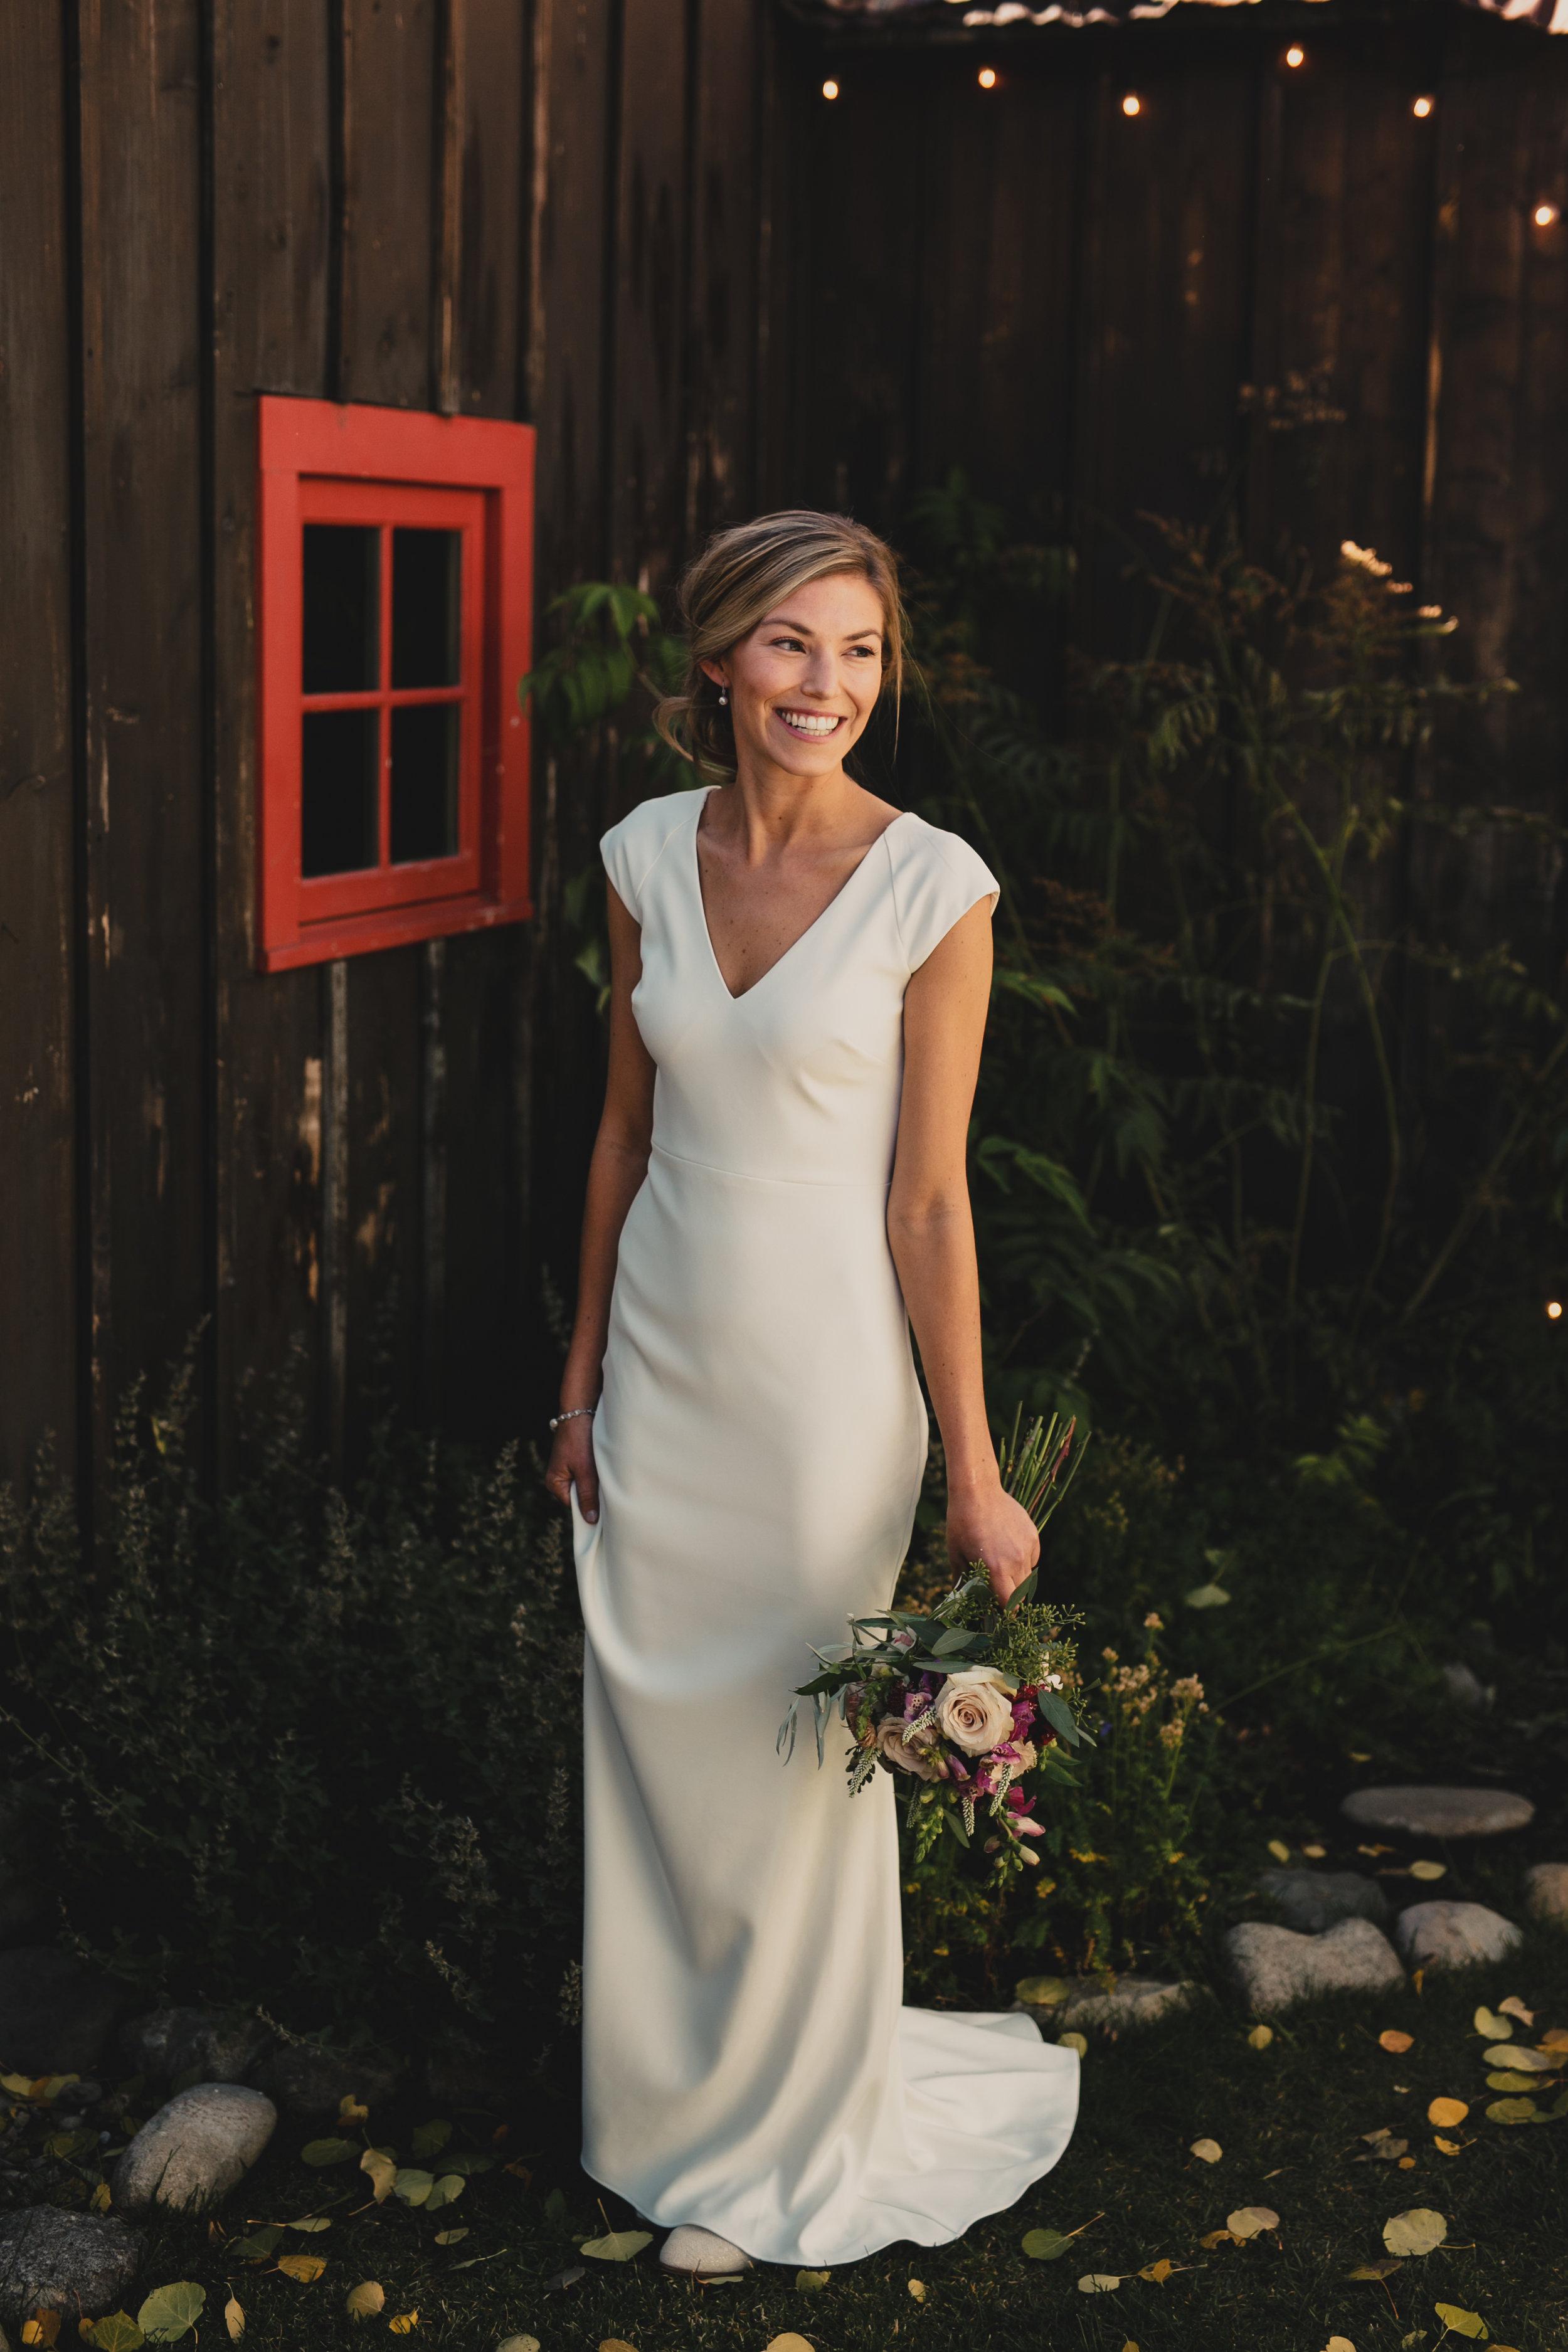 Buena Vista Wedding Photographer